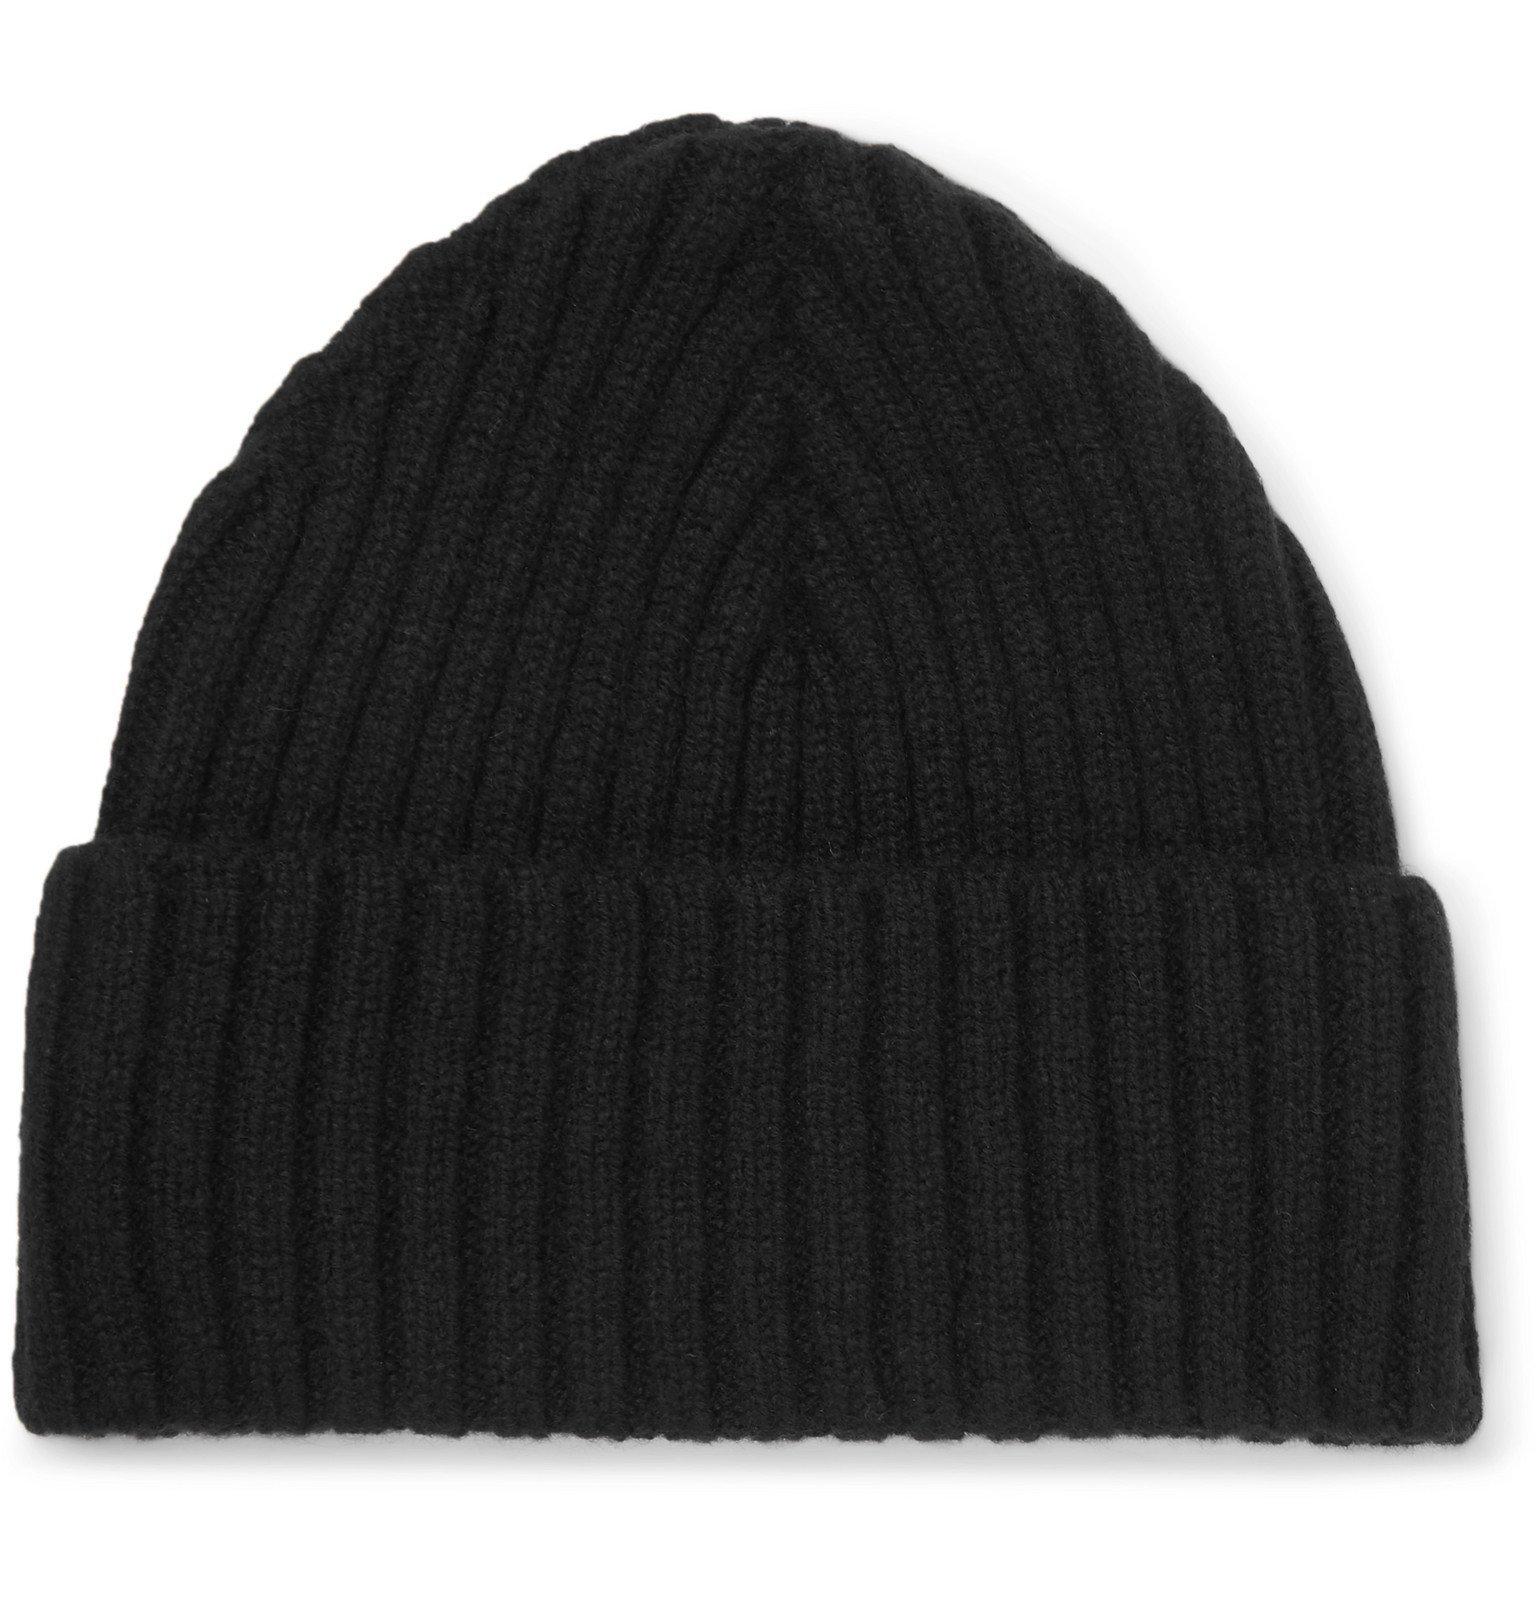 Sunspel - Ribbed Wool Beanie - Black